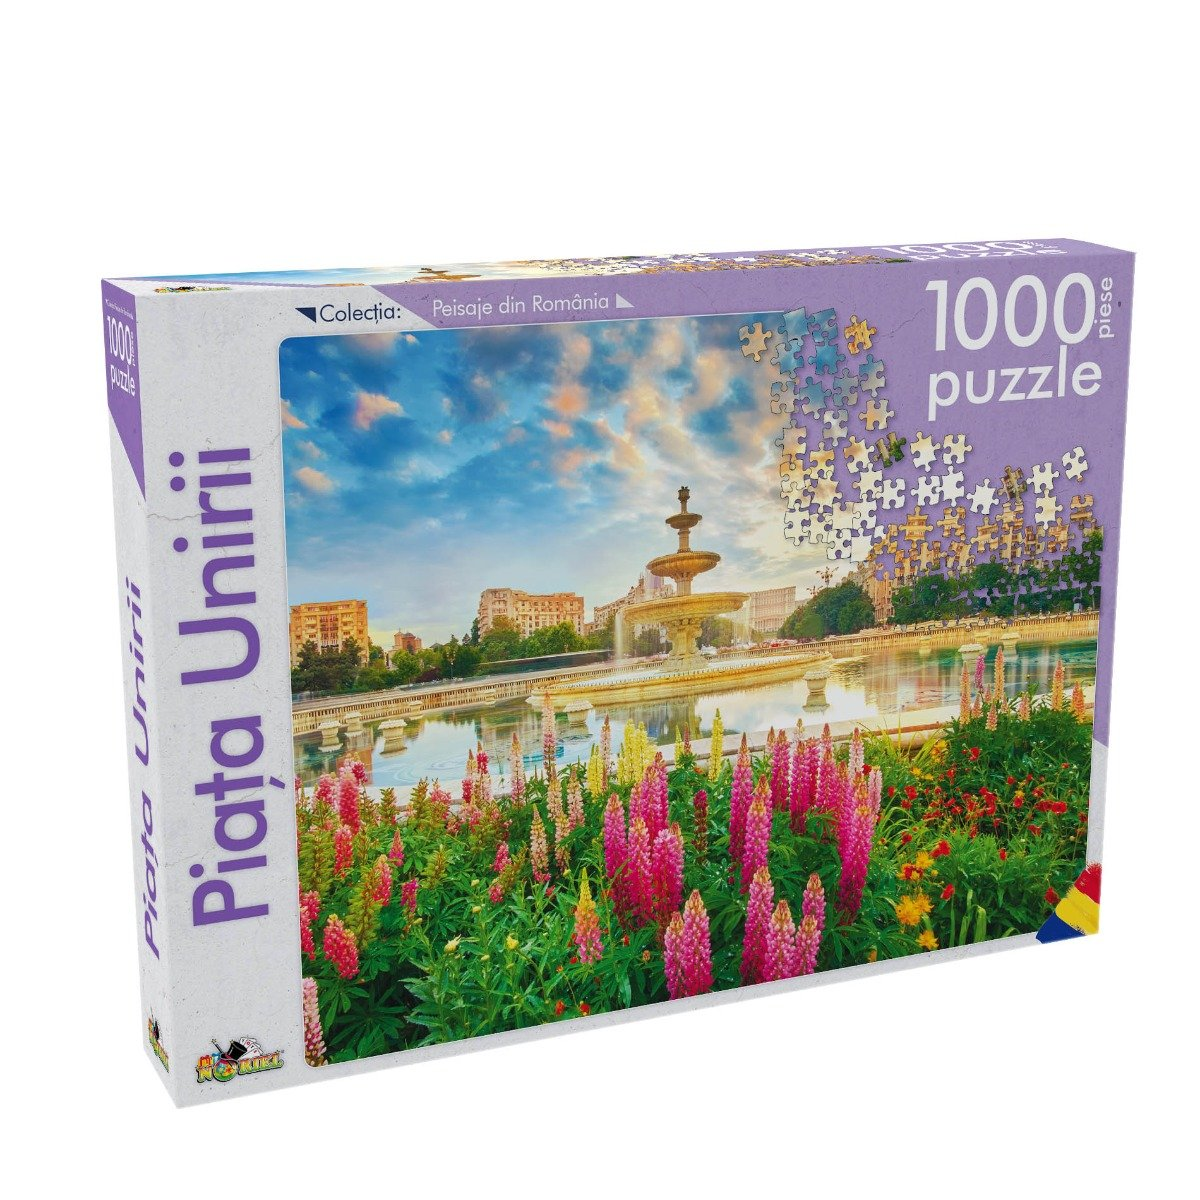 Puzzle Noriel - Peisaje din Romania - Piata Unirii. 1000 Piese